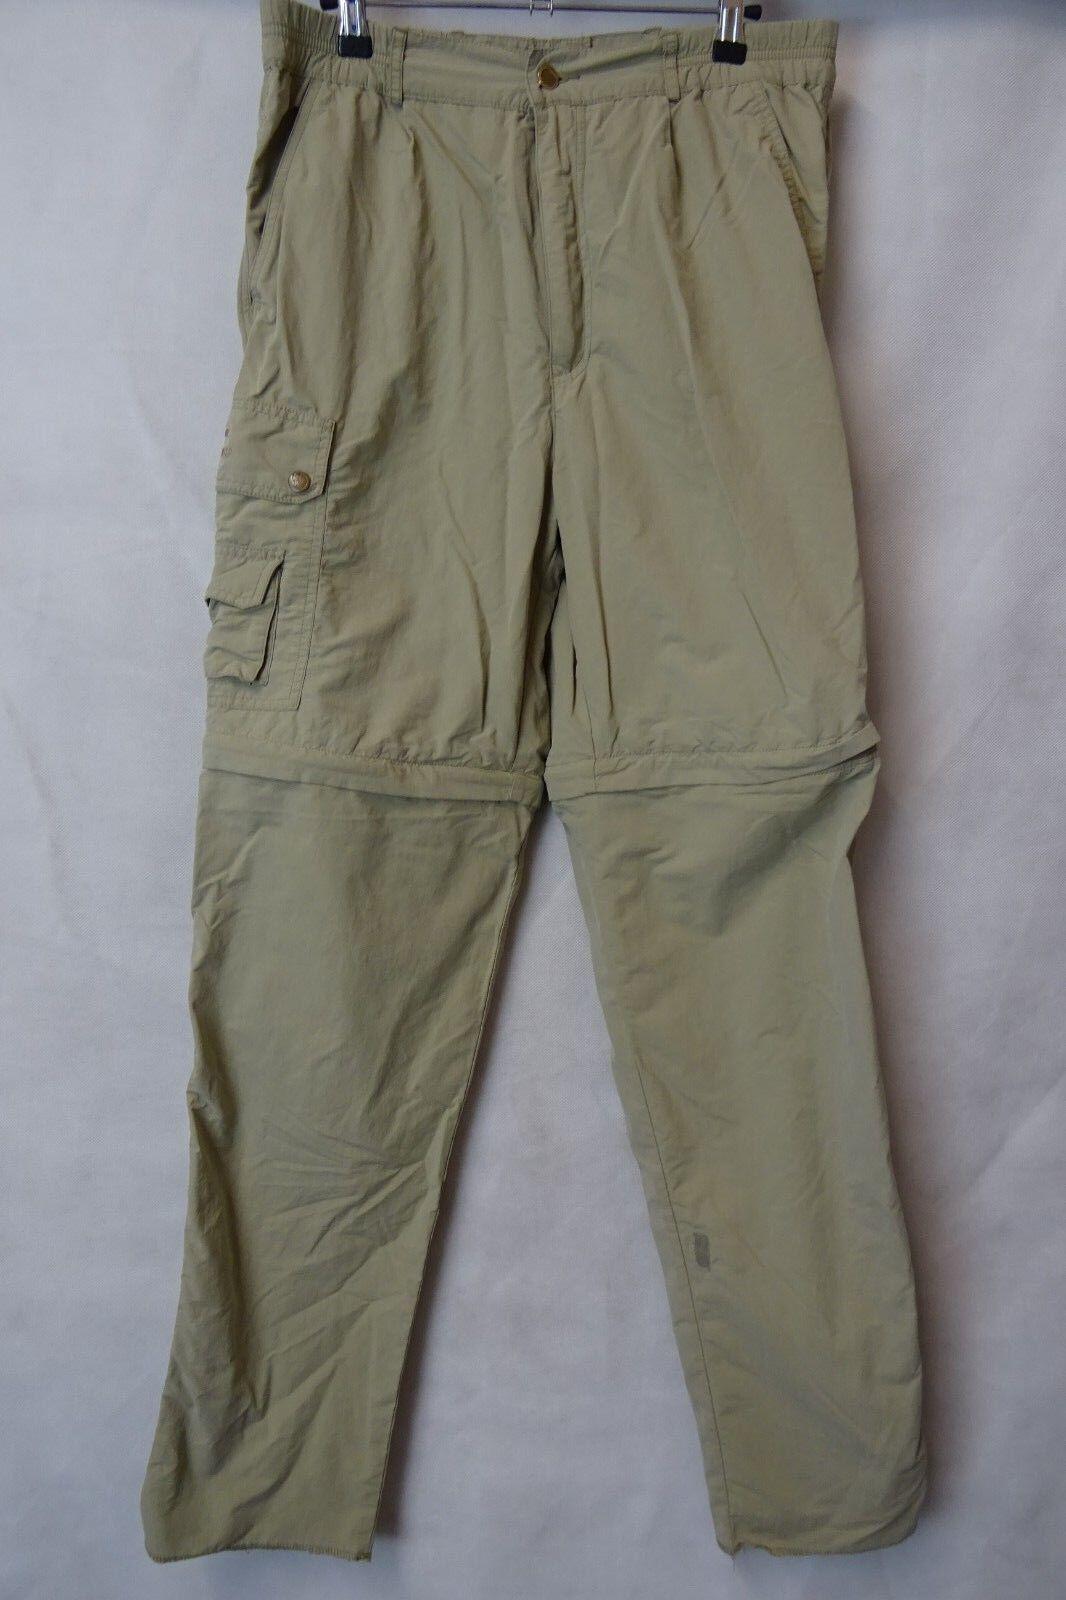 Uomo Fjallraven Outdoor Pantaloni Trekking Combat Taglia W34 L33 AA2547